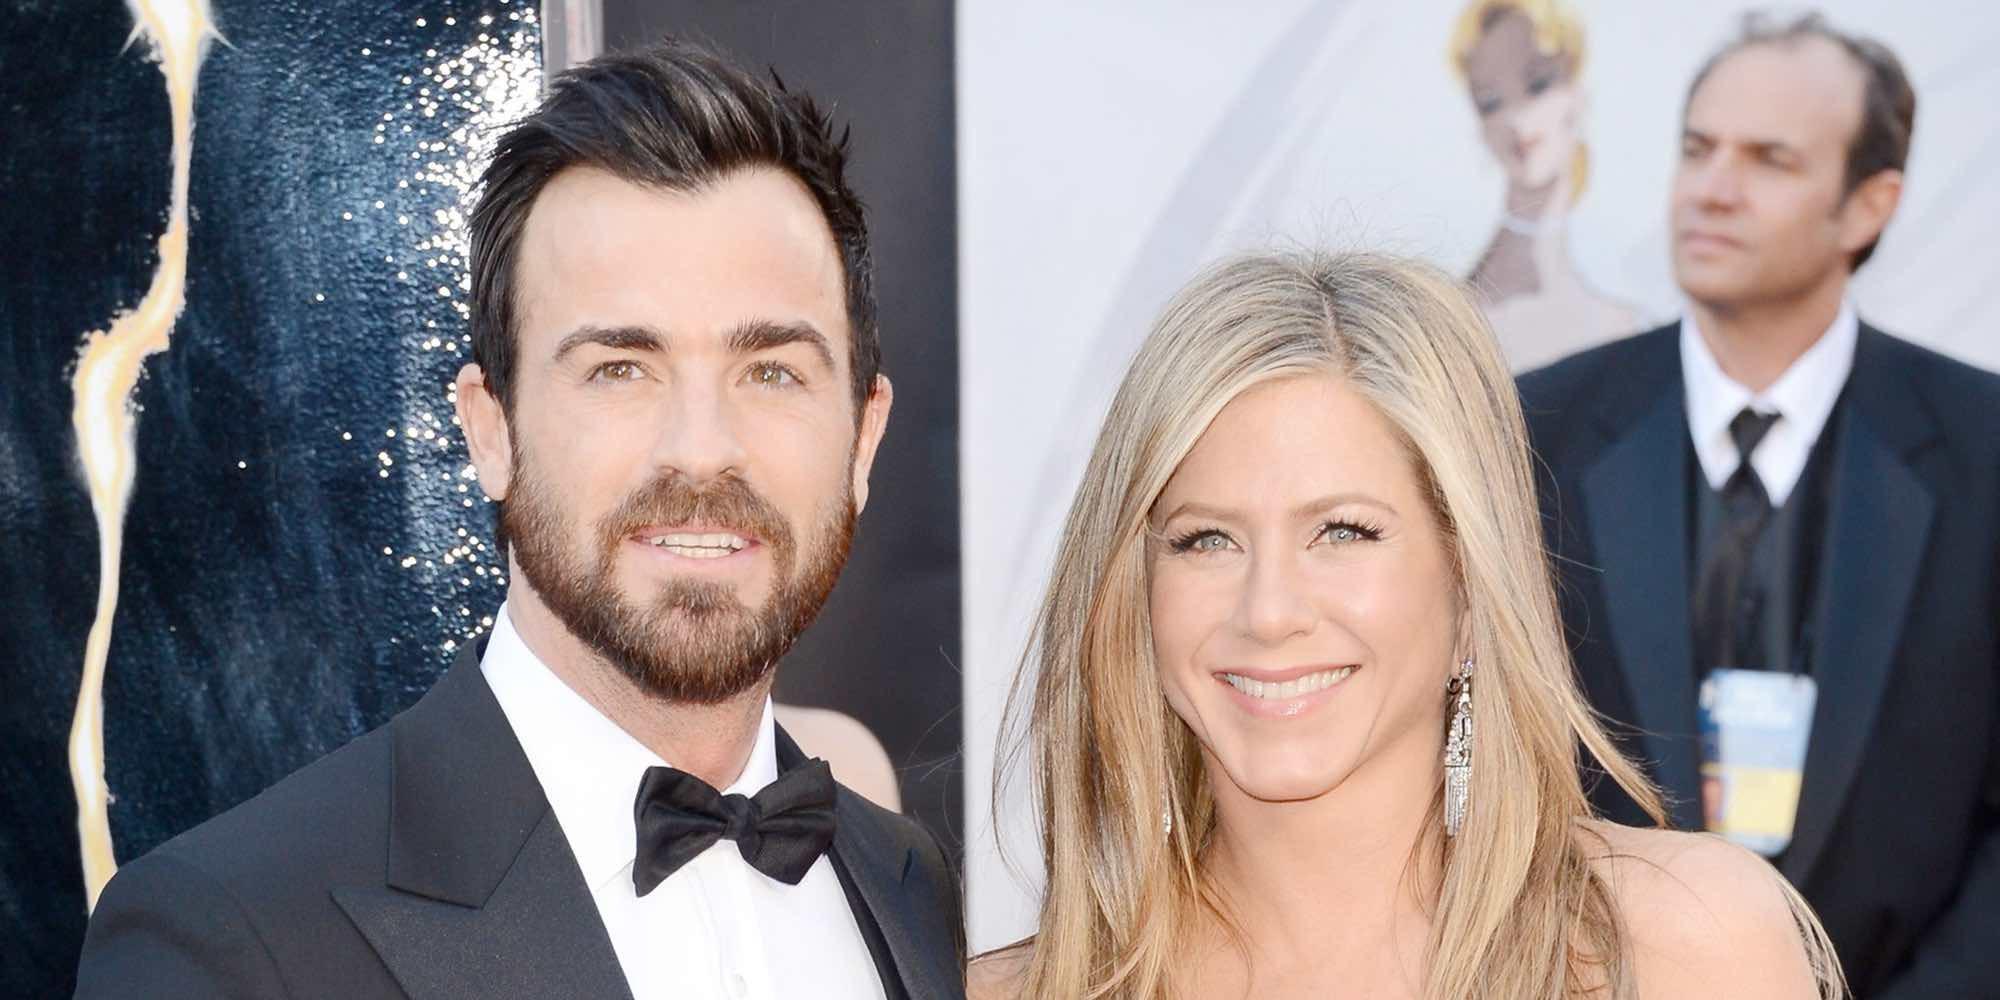 Jennifer Aniston y Justin Theroux anuncian su divorcio